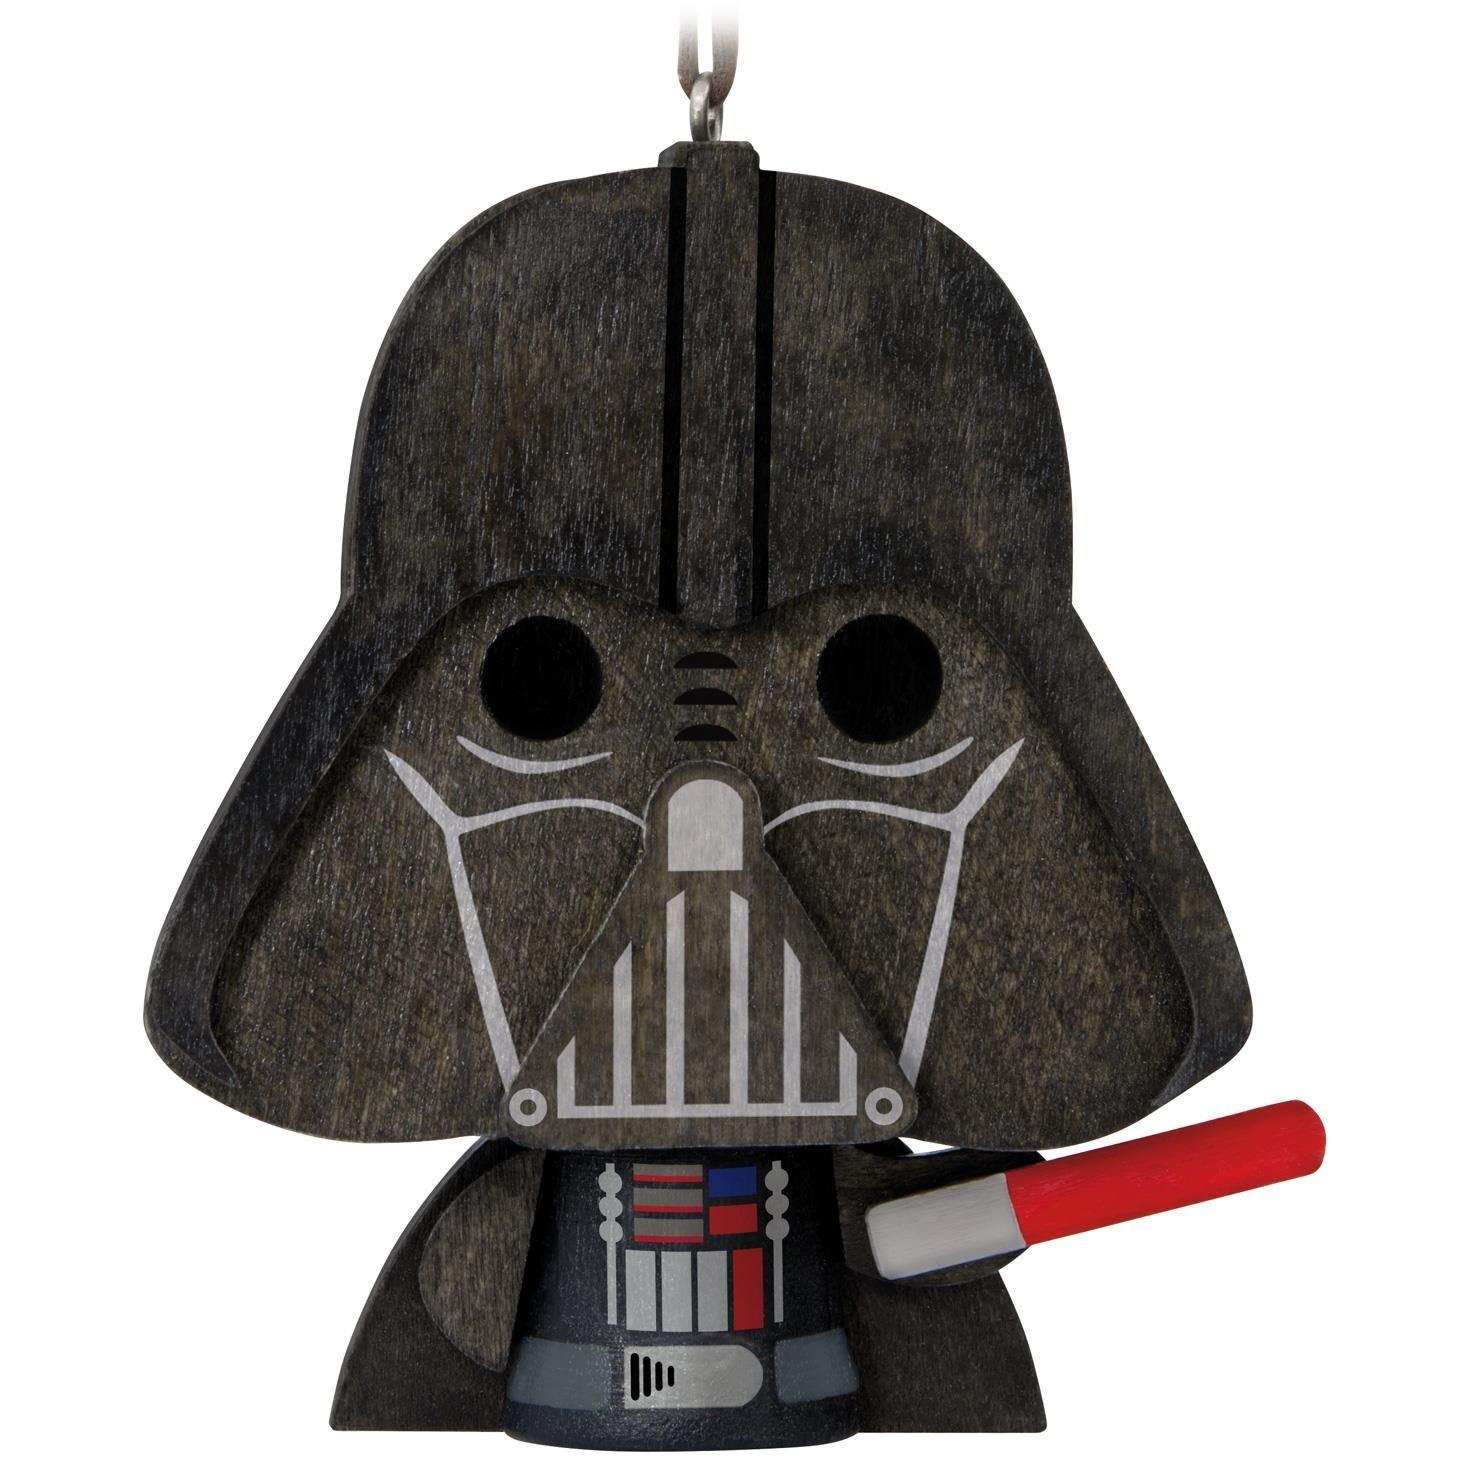 2017 Hallmark Star Wars Darth Vader Wood Ornament